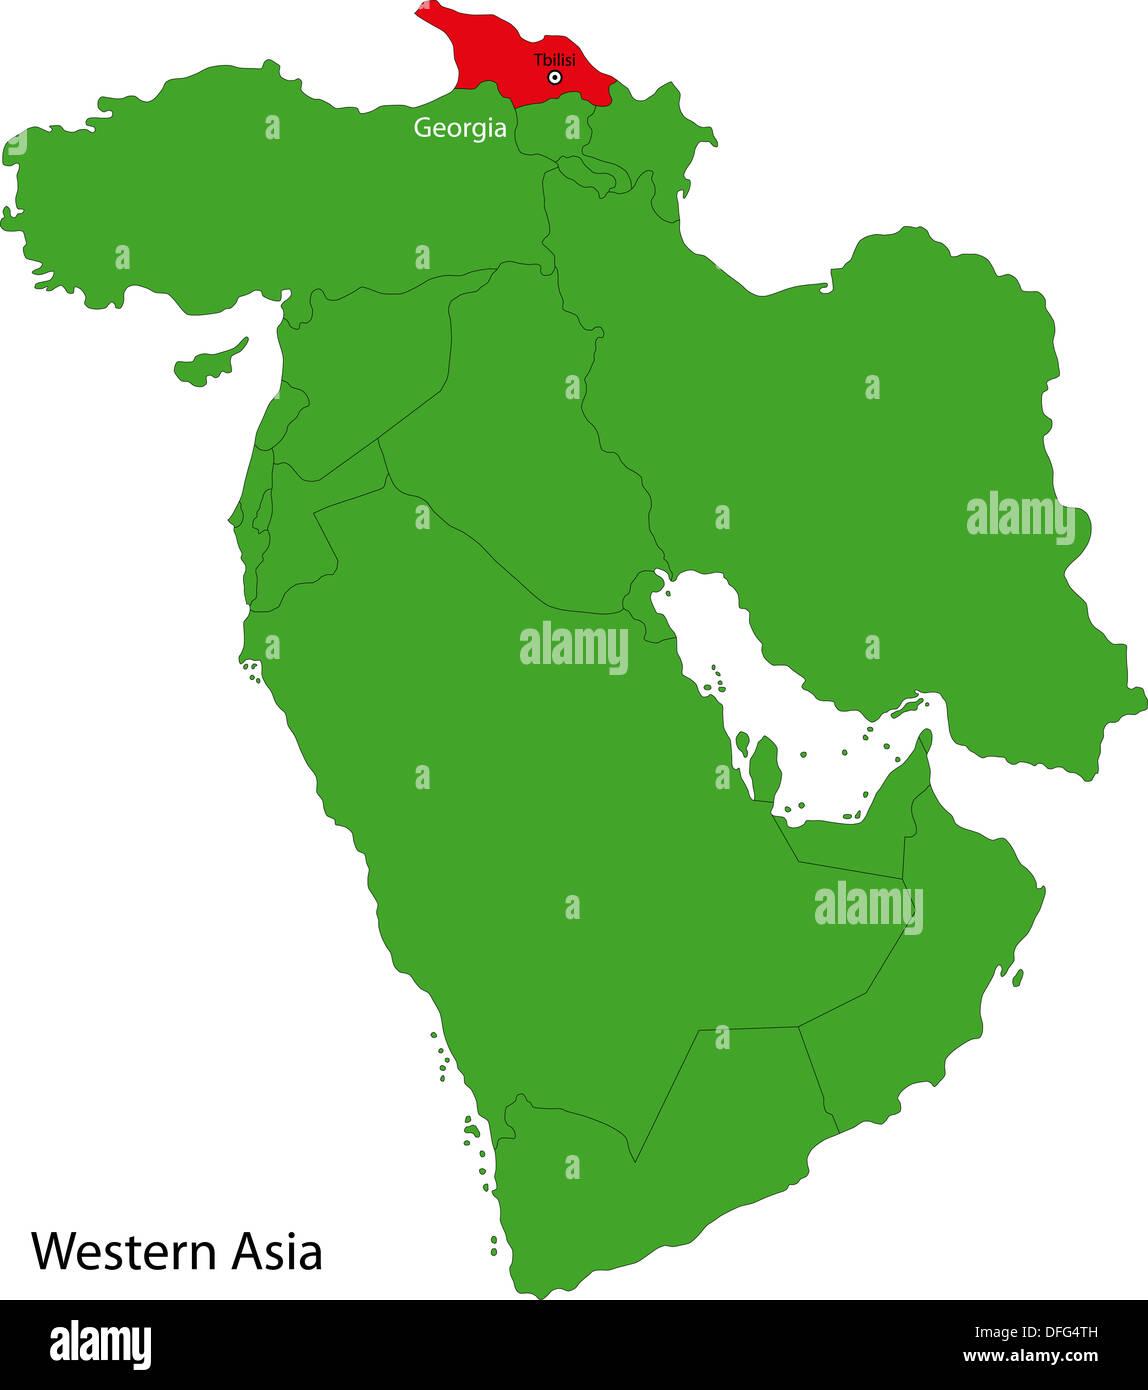 Georgia map - Stock Image